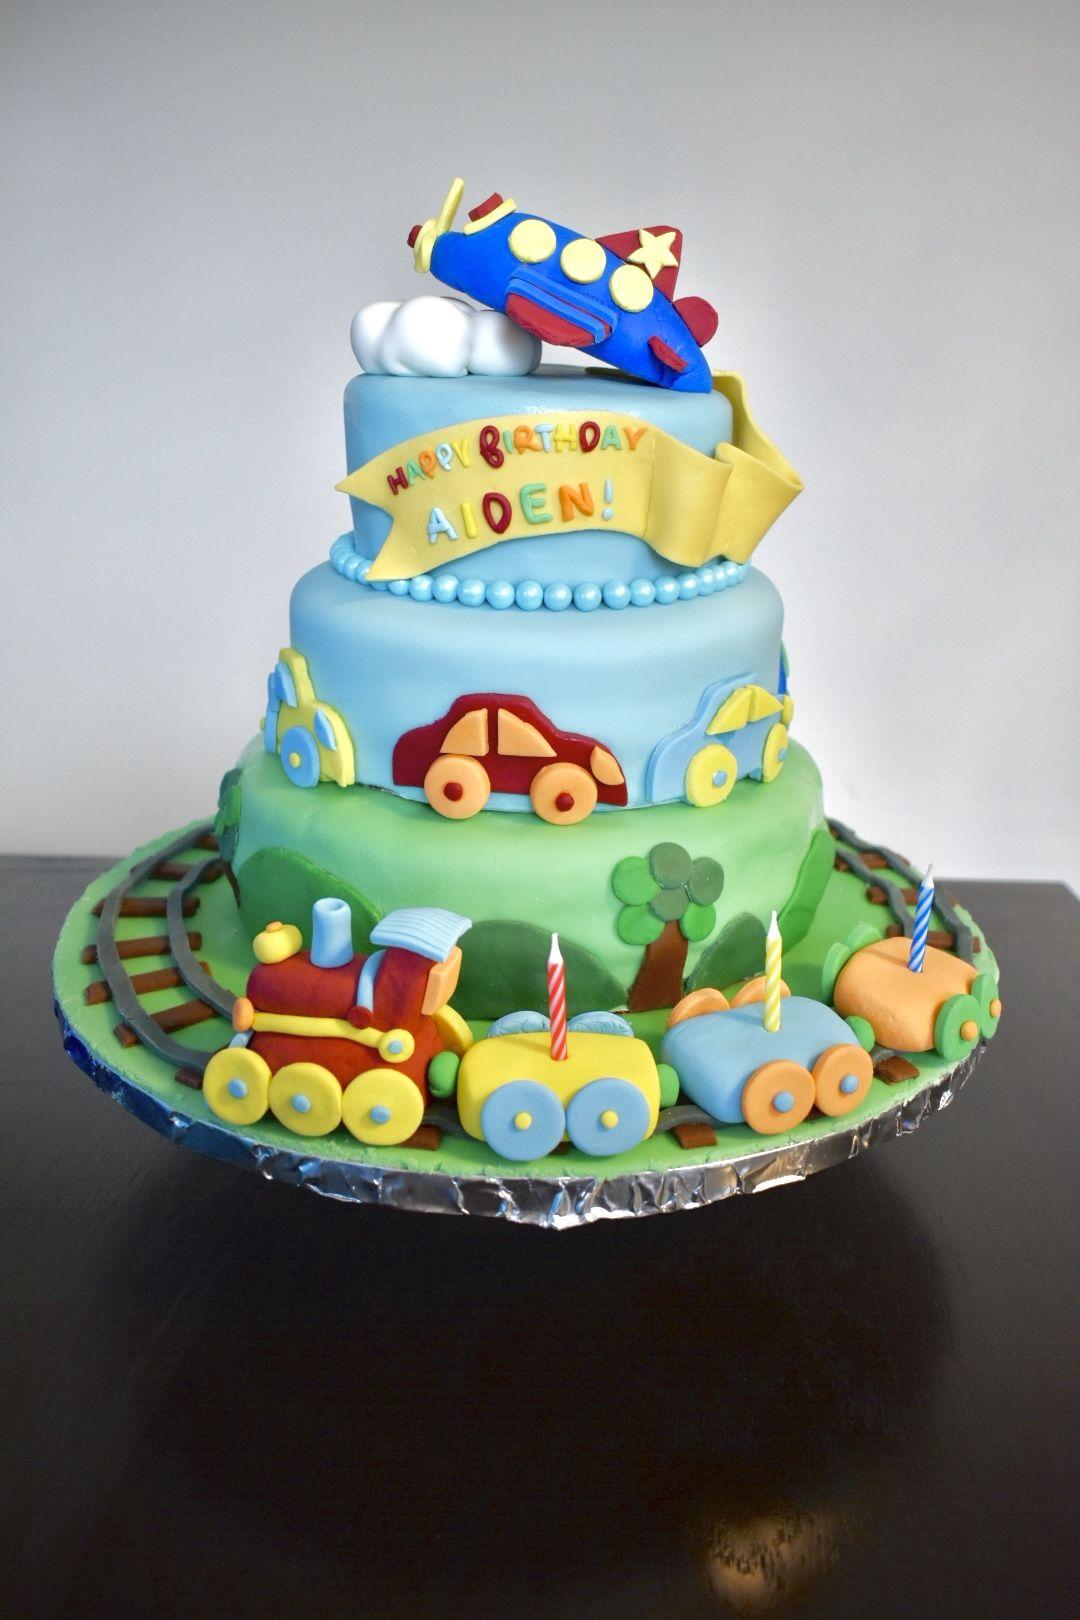 Wondrous Transportation Planes Trains Cars Birthday Cake Cars Birthday Funny Birthday Cards Online Hendilapandamsfinfo